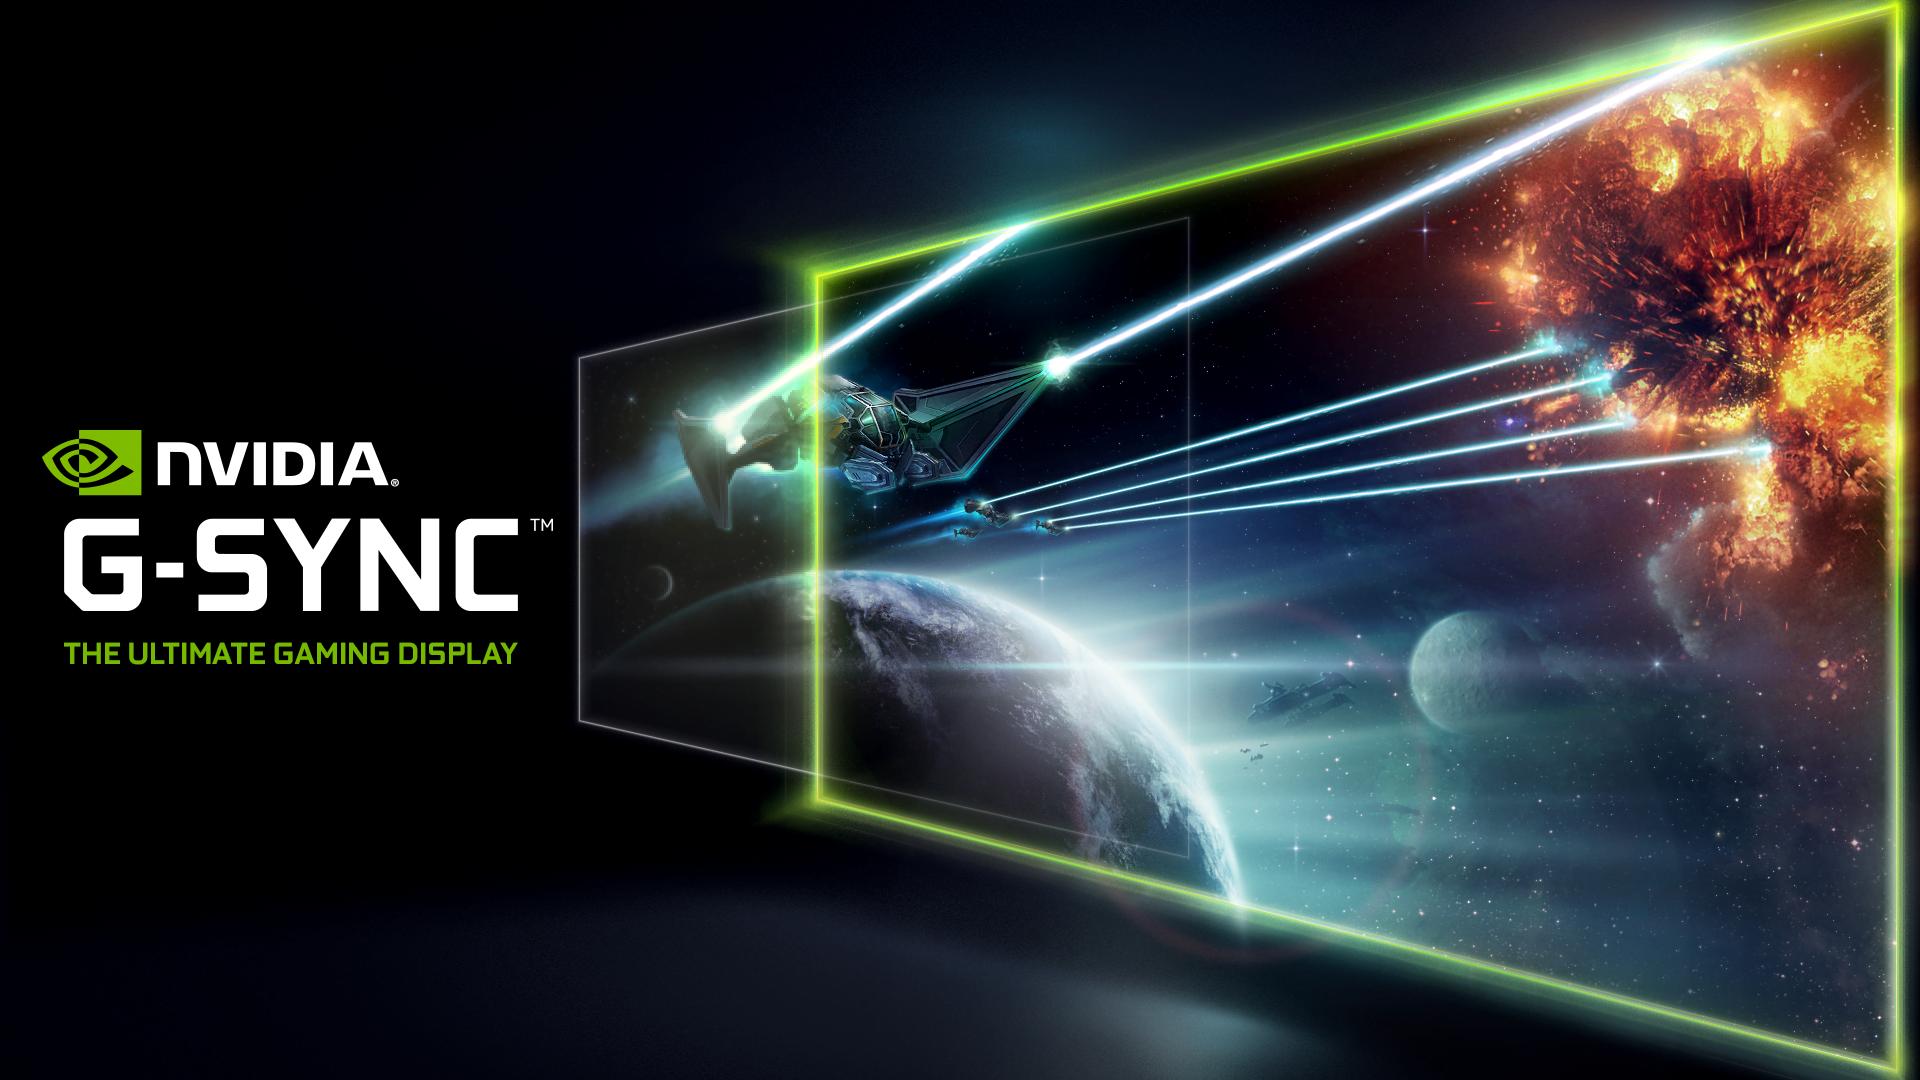 nvidia g sync ces 2017 custompcreview